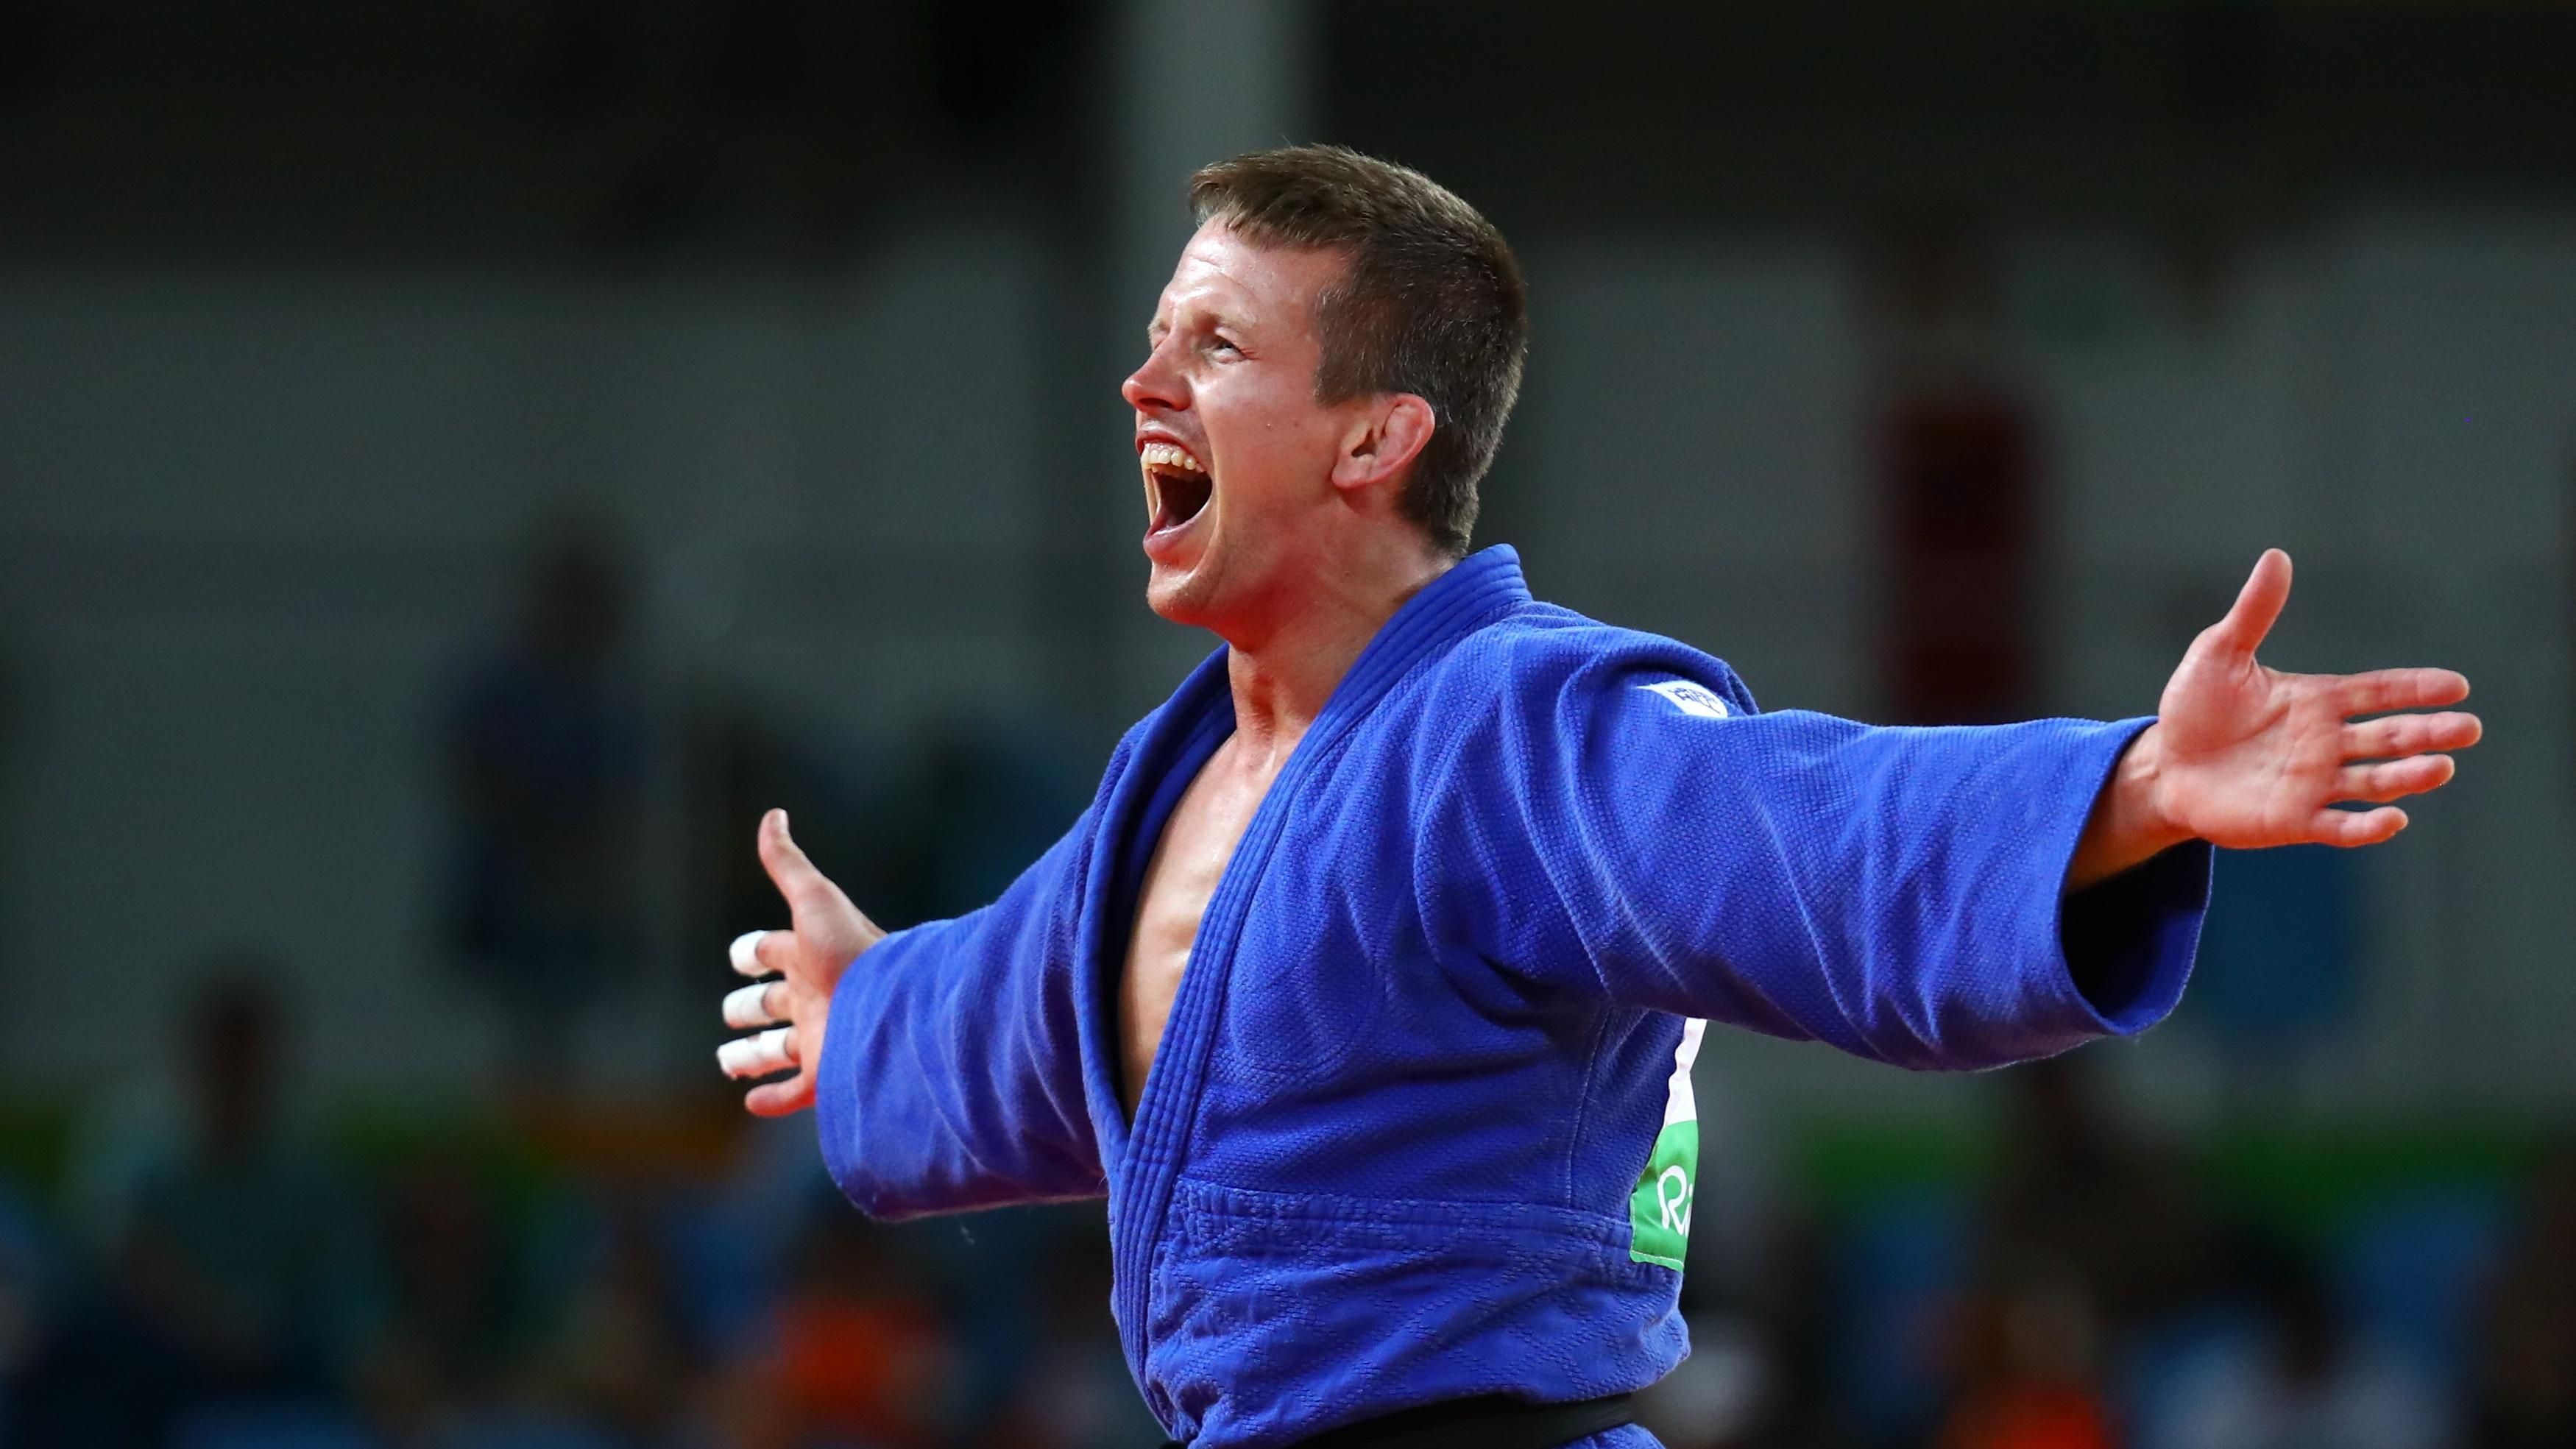 2016 Rio Olympics - Judo - Final - Men -73 kg Bronze Medal Contests - Carioca Arena 2 - Rio de Janeiro, Brazil - 08/08/2016. Dirk Van Tichelt (BEL) of Belgium celebrates. REUTERS/Kai Pfaffenbach FOR EDITORIAL USE ONLY. NOT FOR SALE FOR MARKETING OR ADVERTISING CAMPAIGNS.